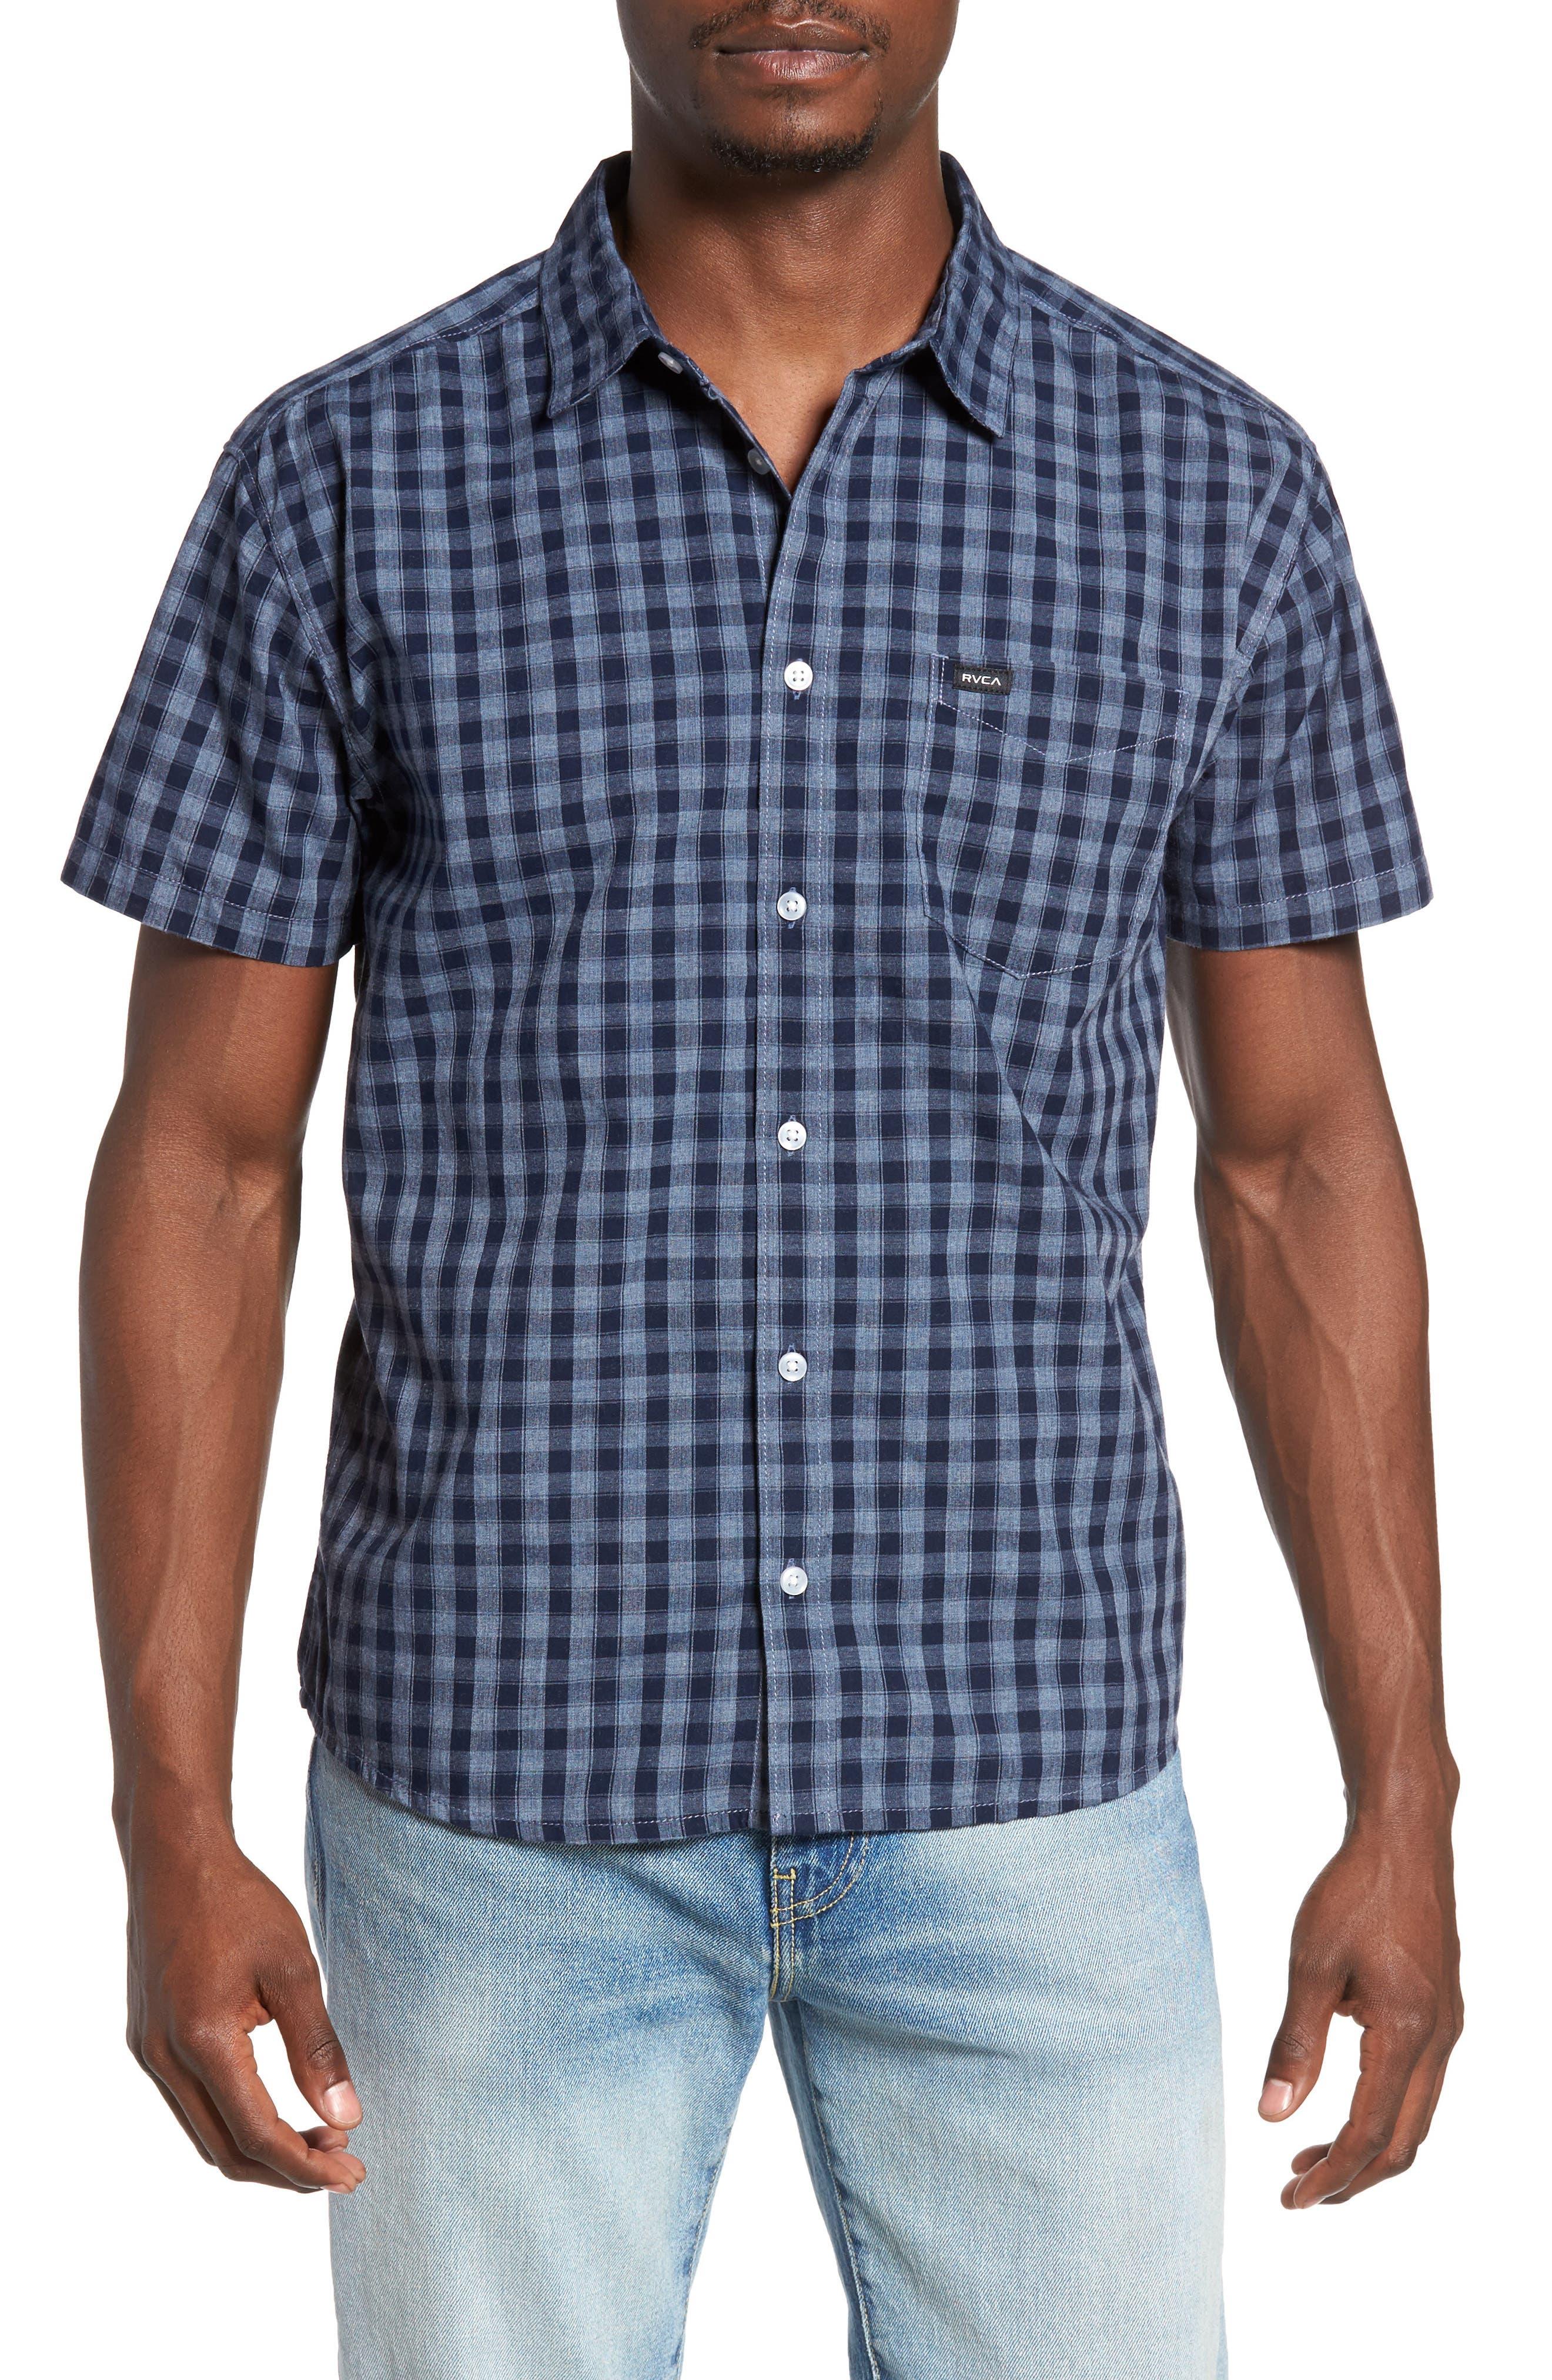 RVCA Check Woven Shirt